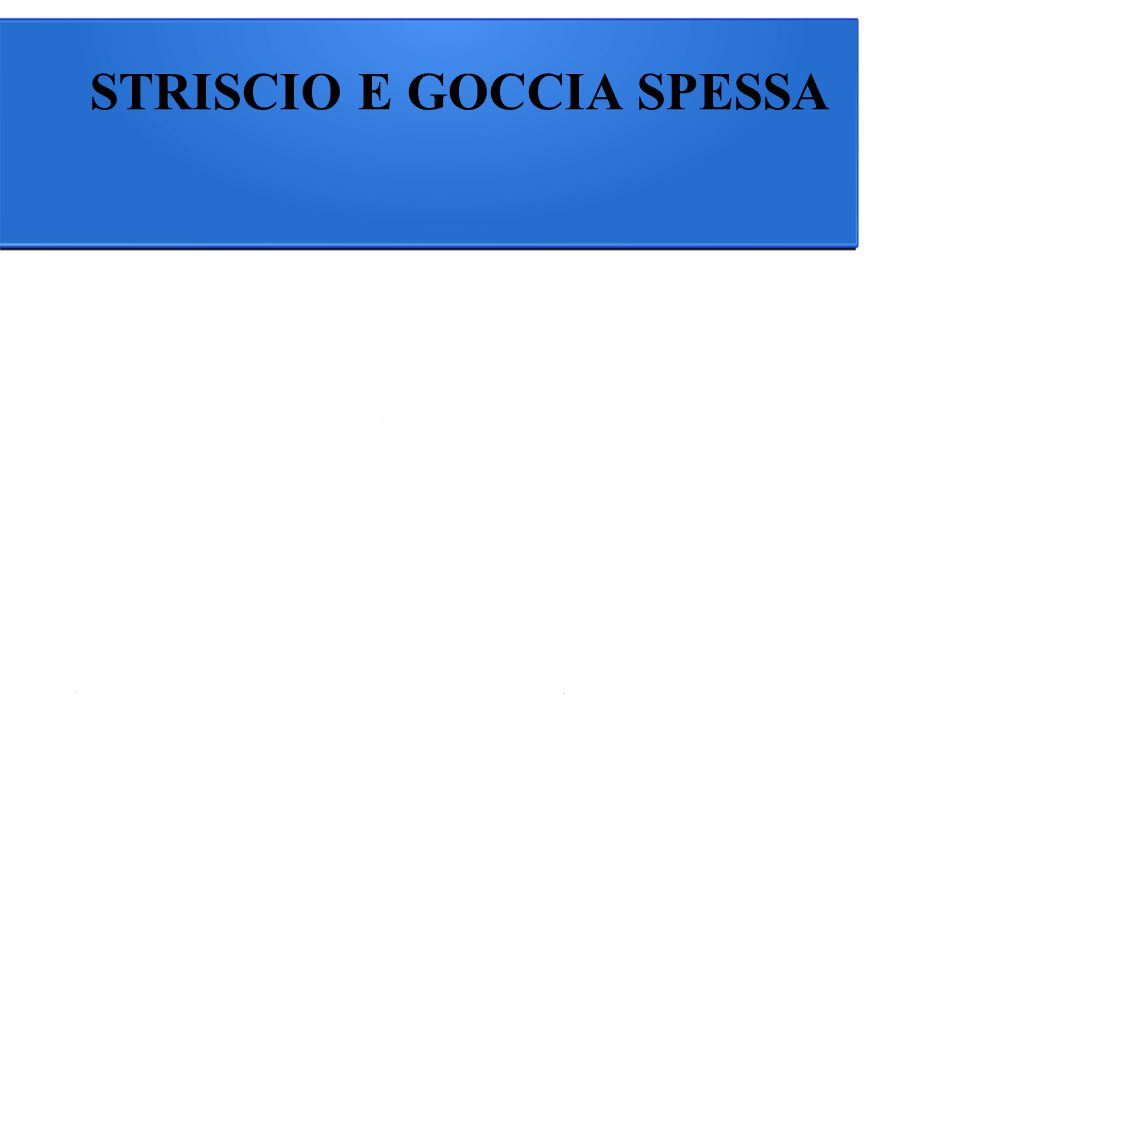 STRISCIO E GOCCIA SPESSA